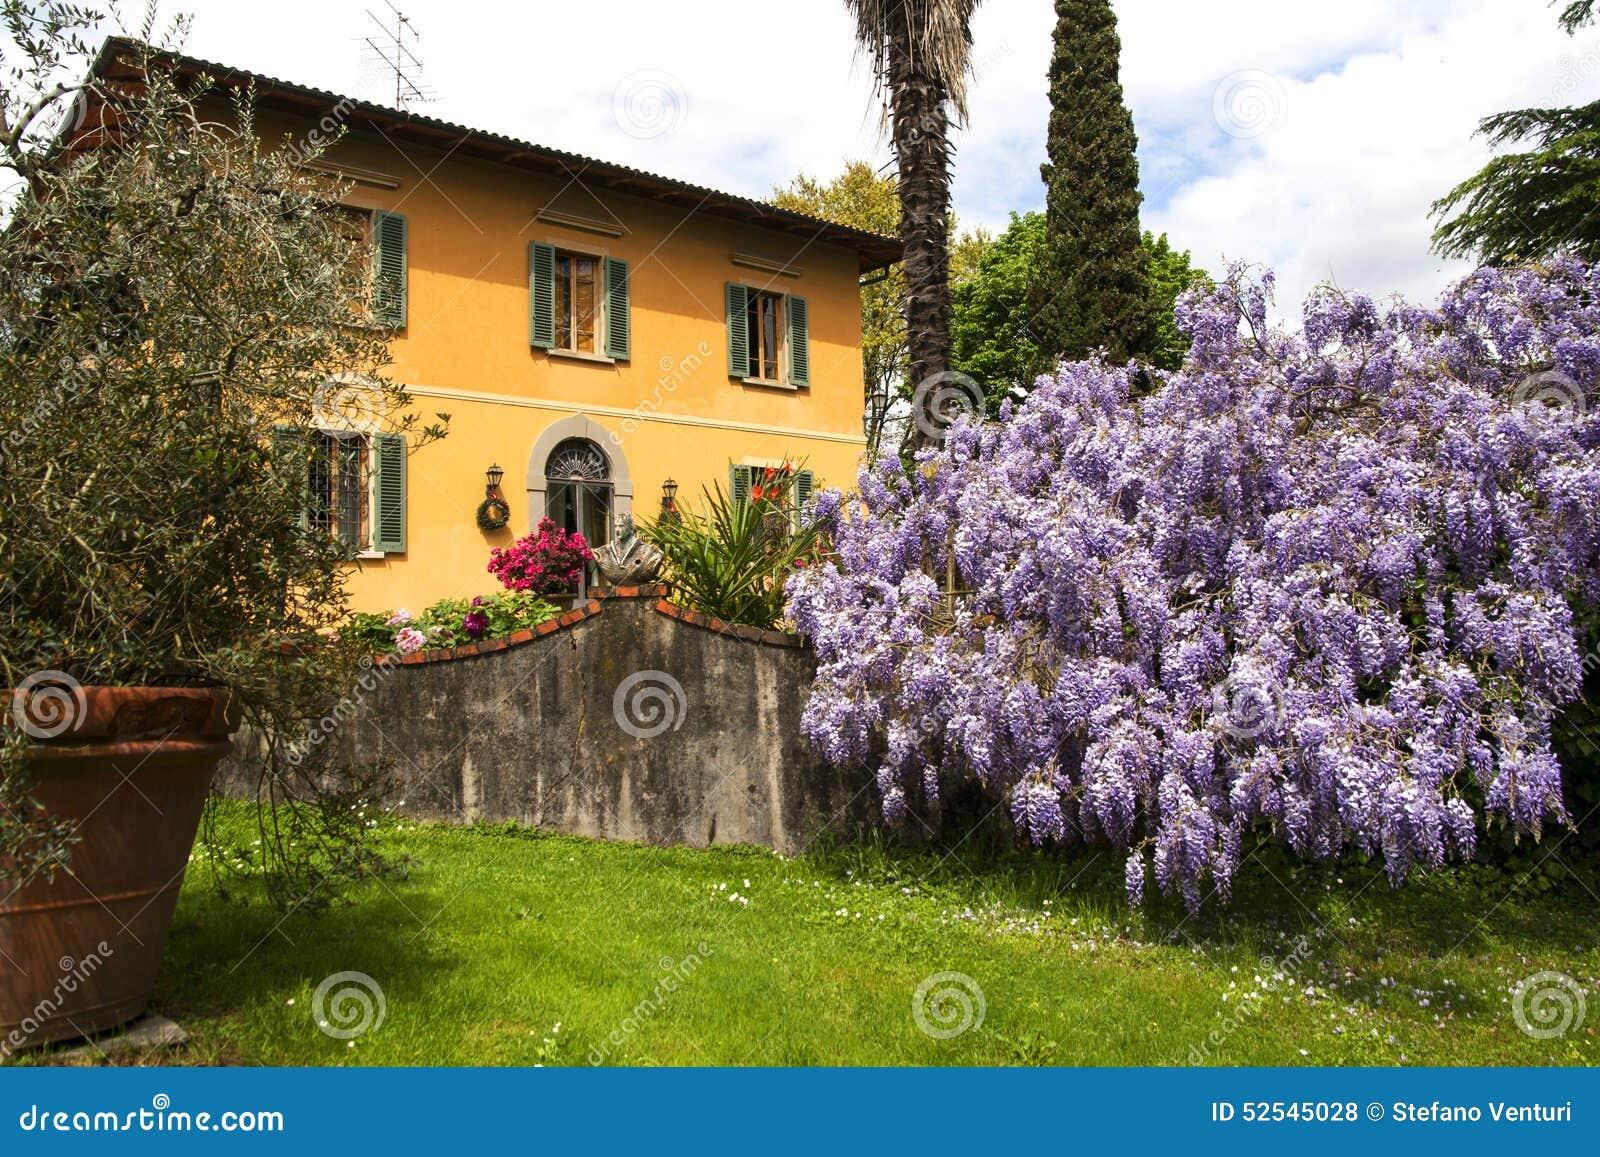 Bella casa di campagna in toscana con la grande pianta for Casa di campagna toscana